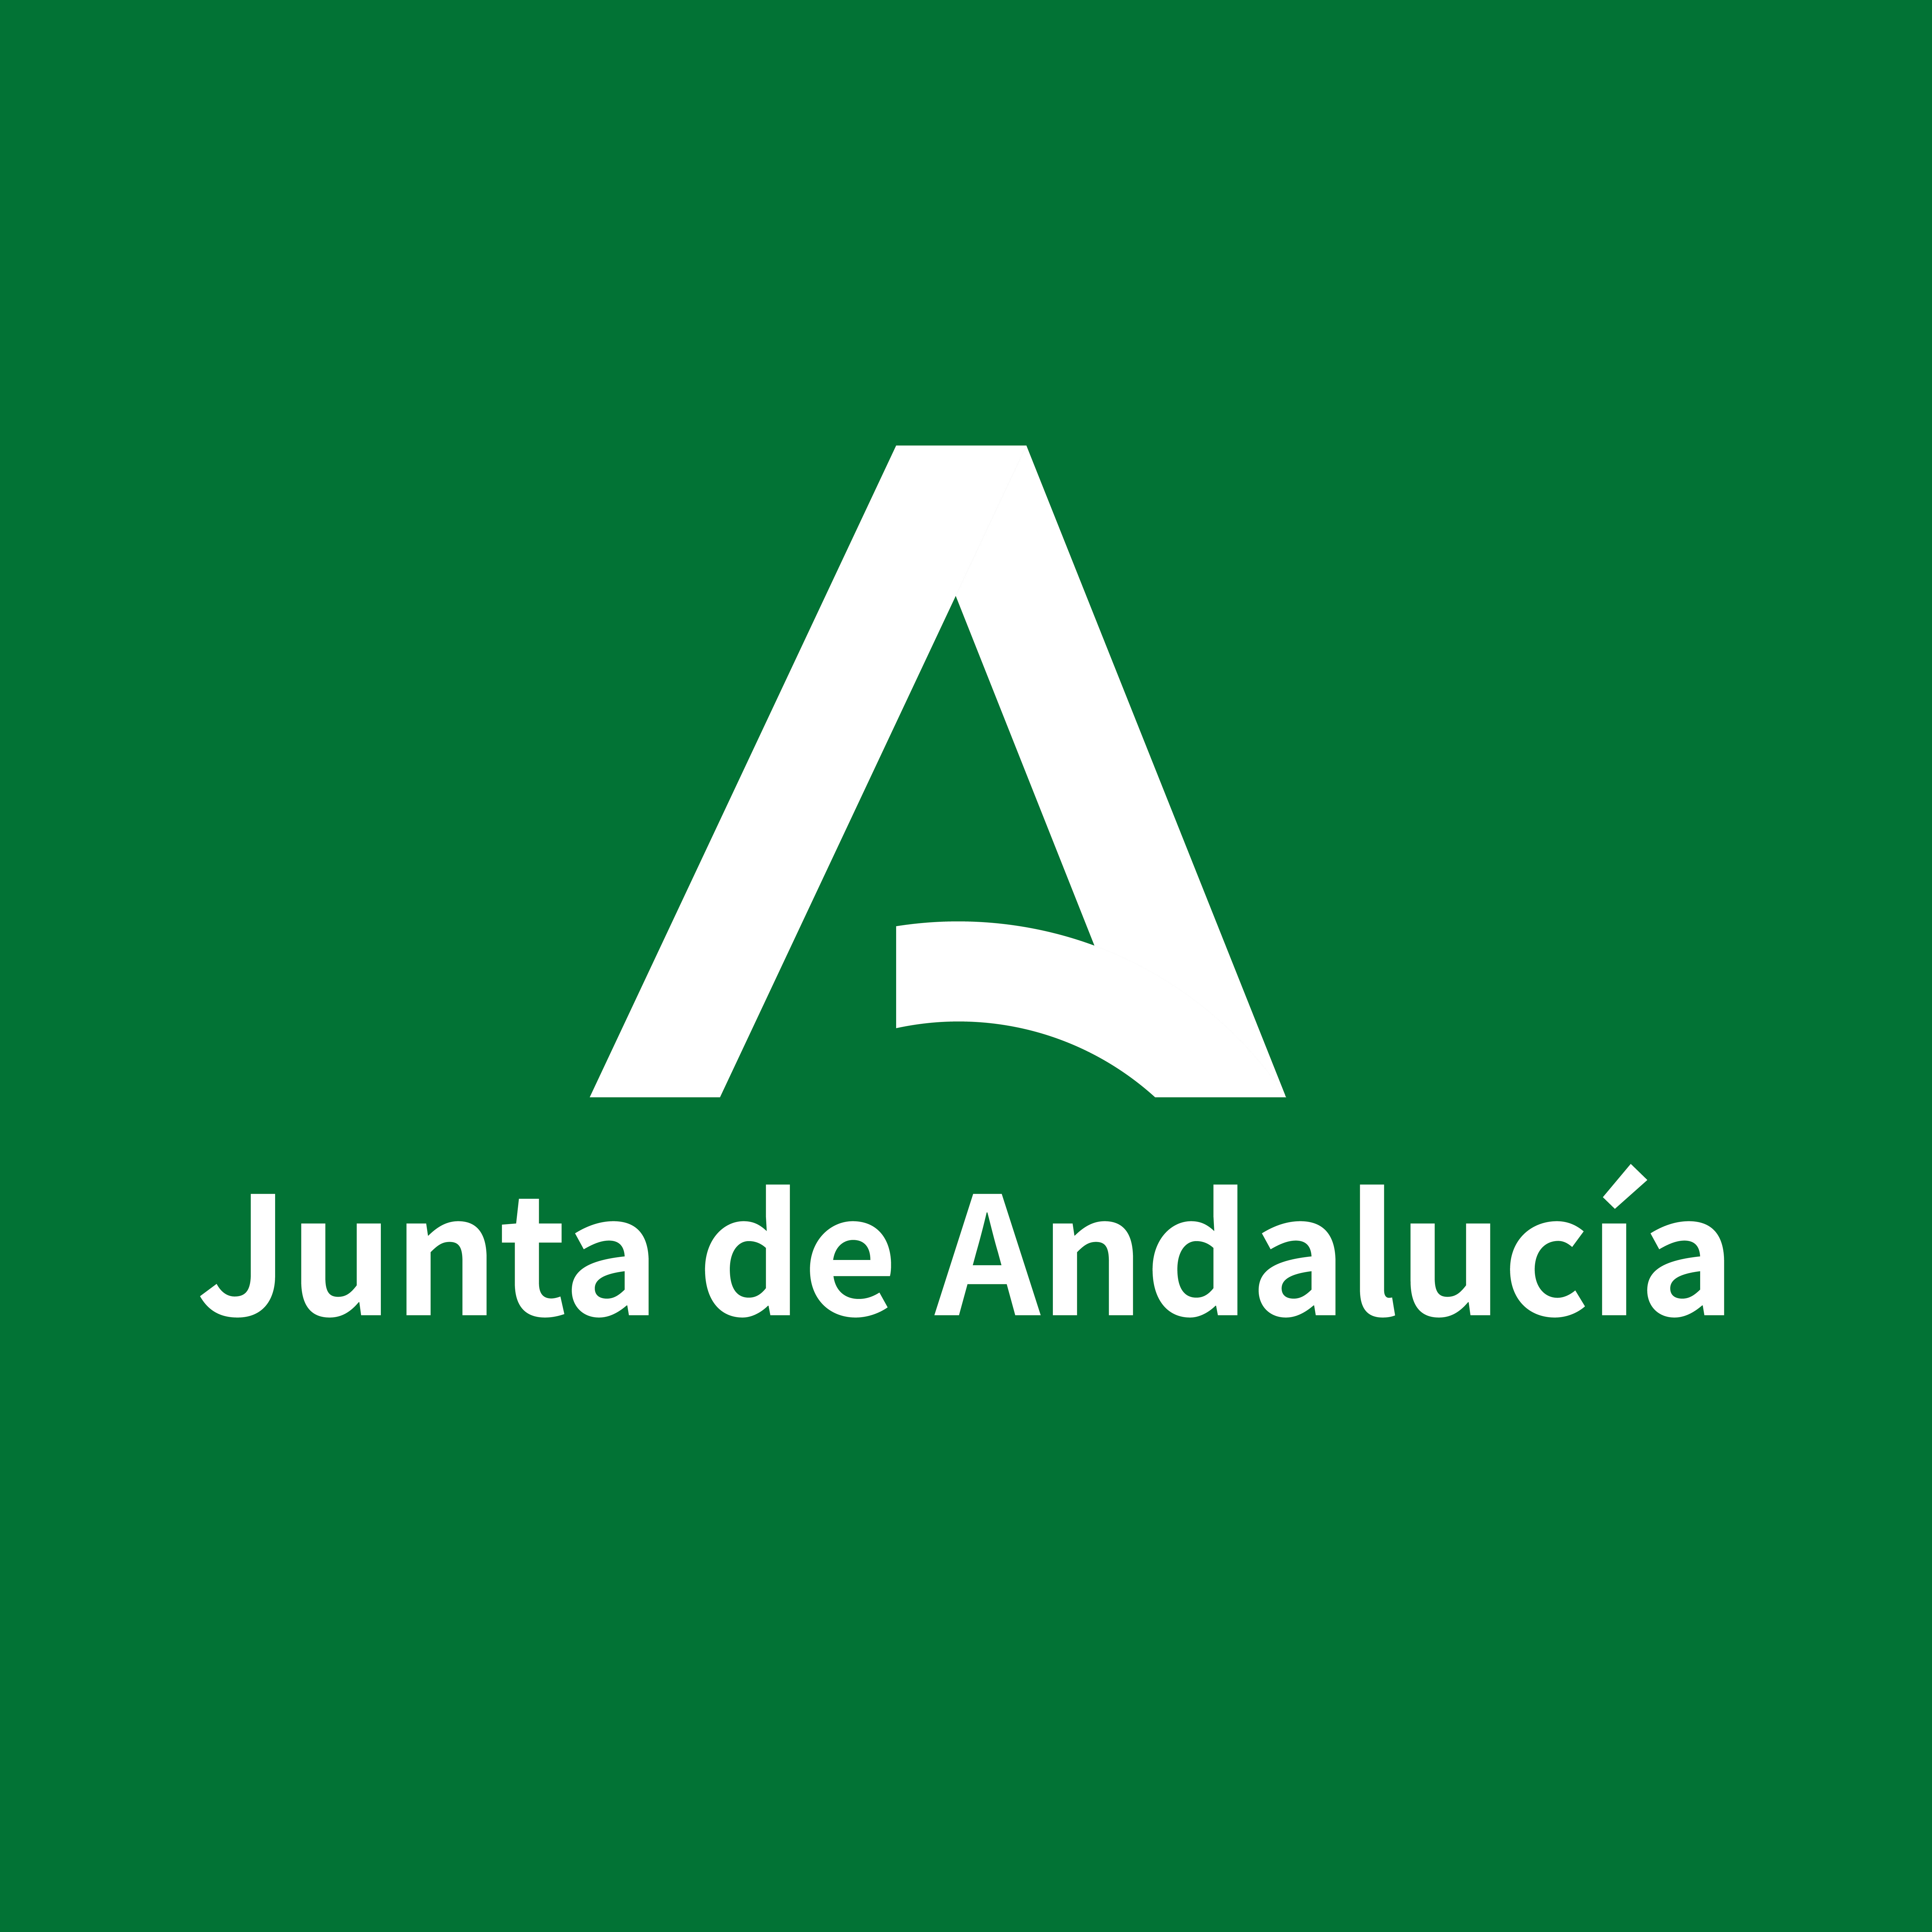 marca-generica-junta-de-andalucia-fondo-verde